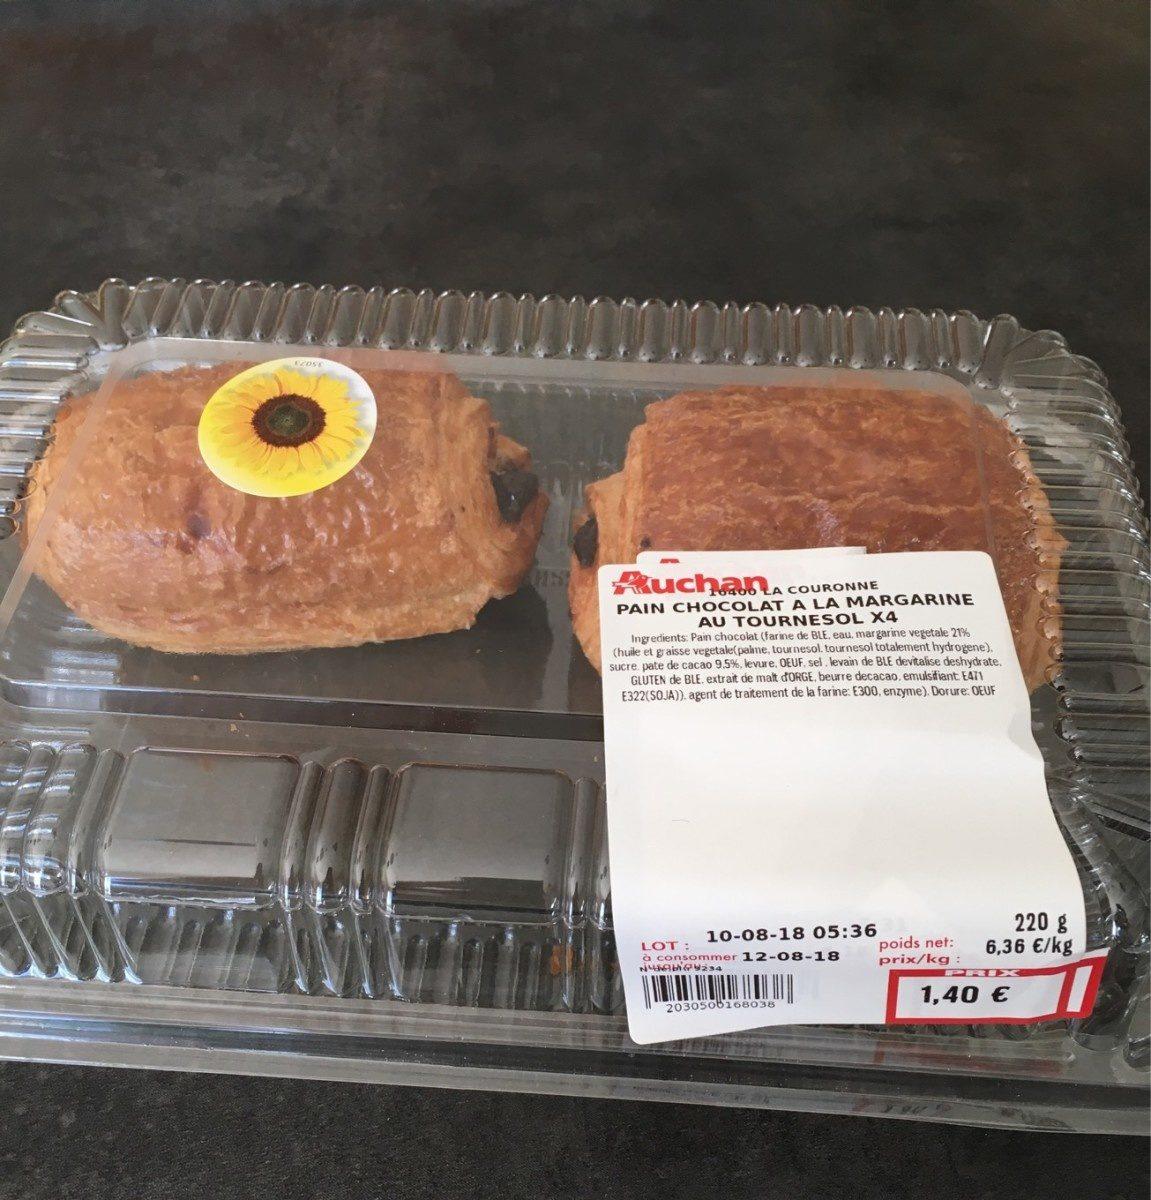 Pain au chocolat a la margarine au tournesol x4 - Product